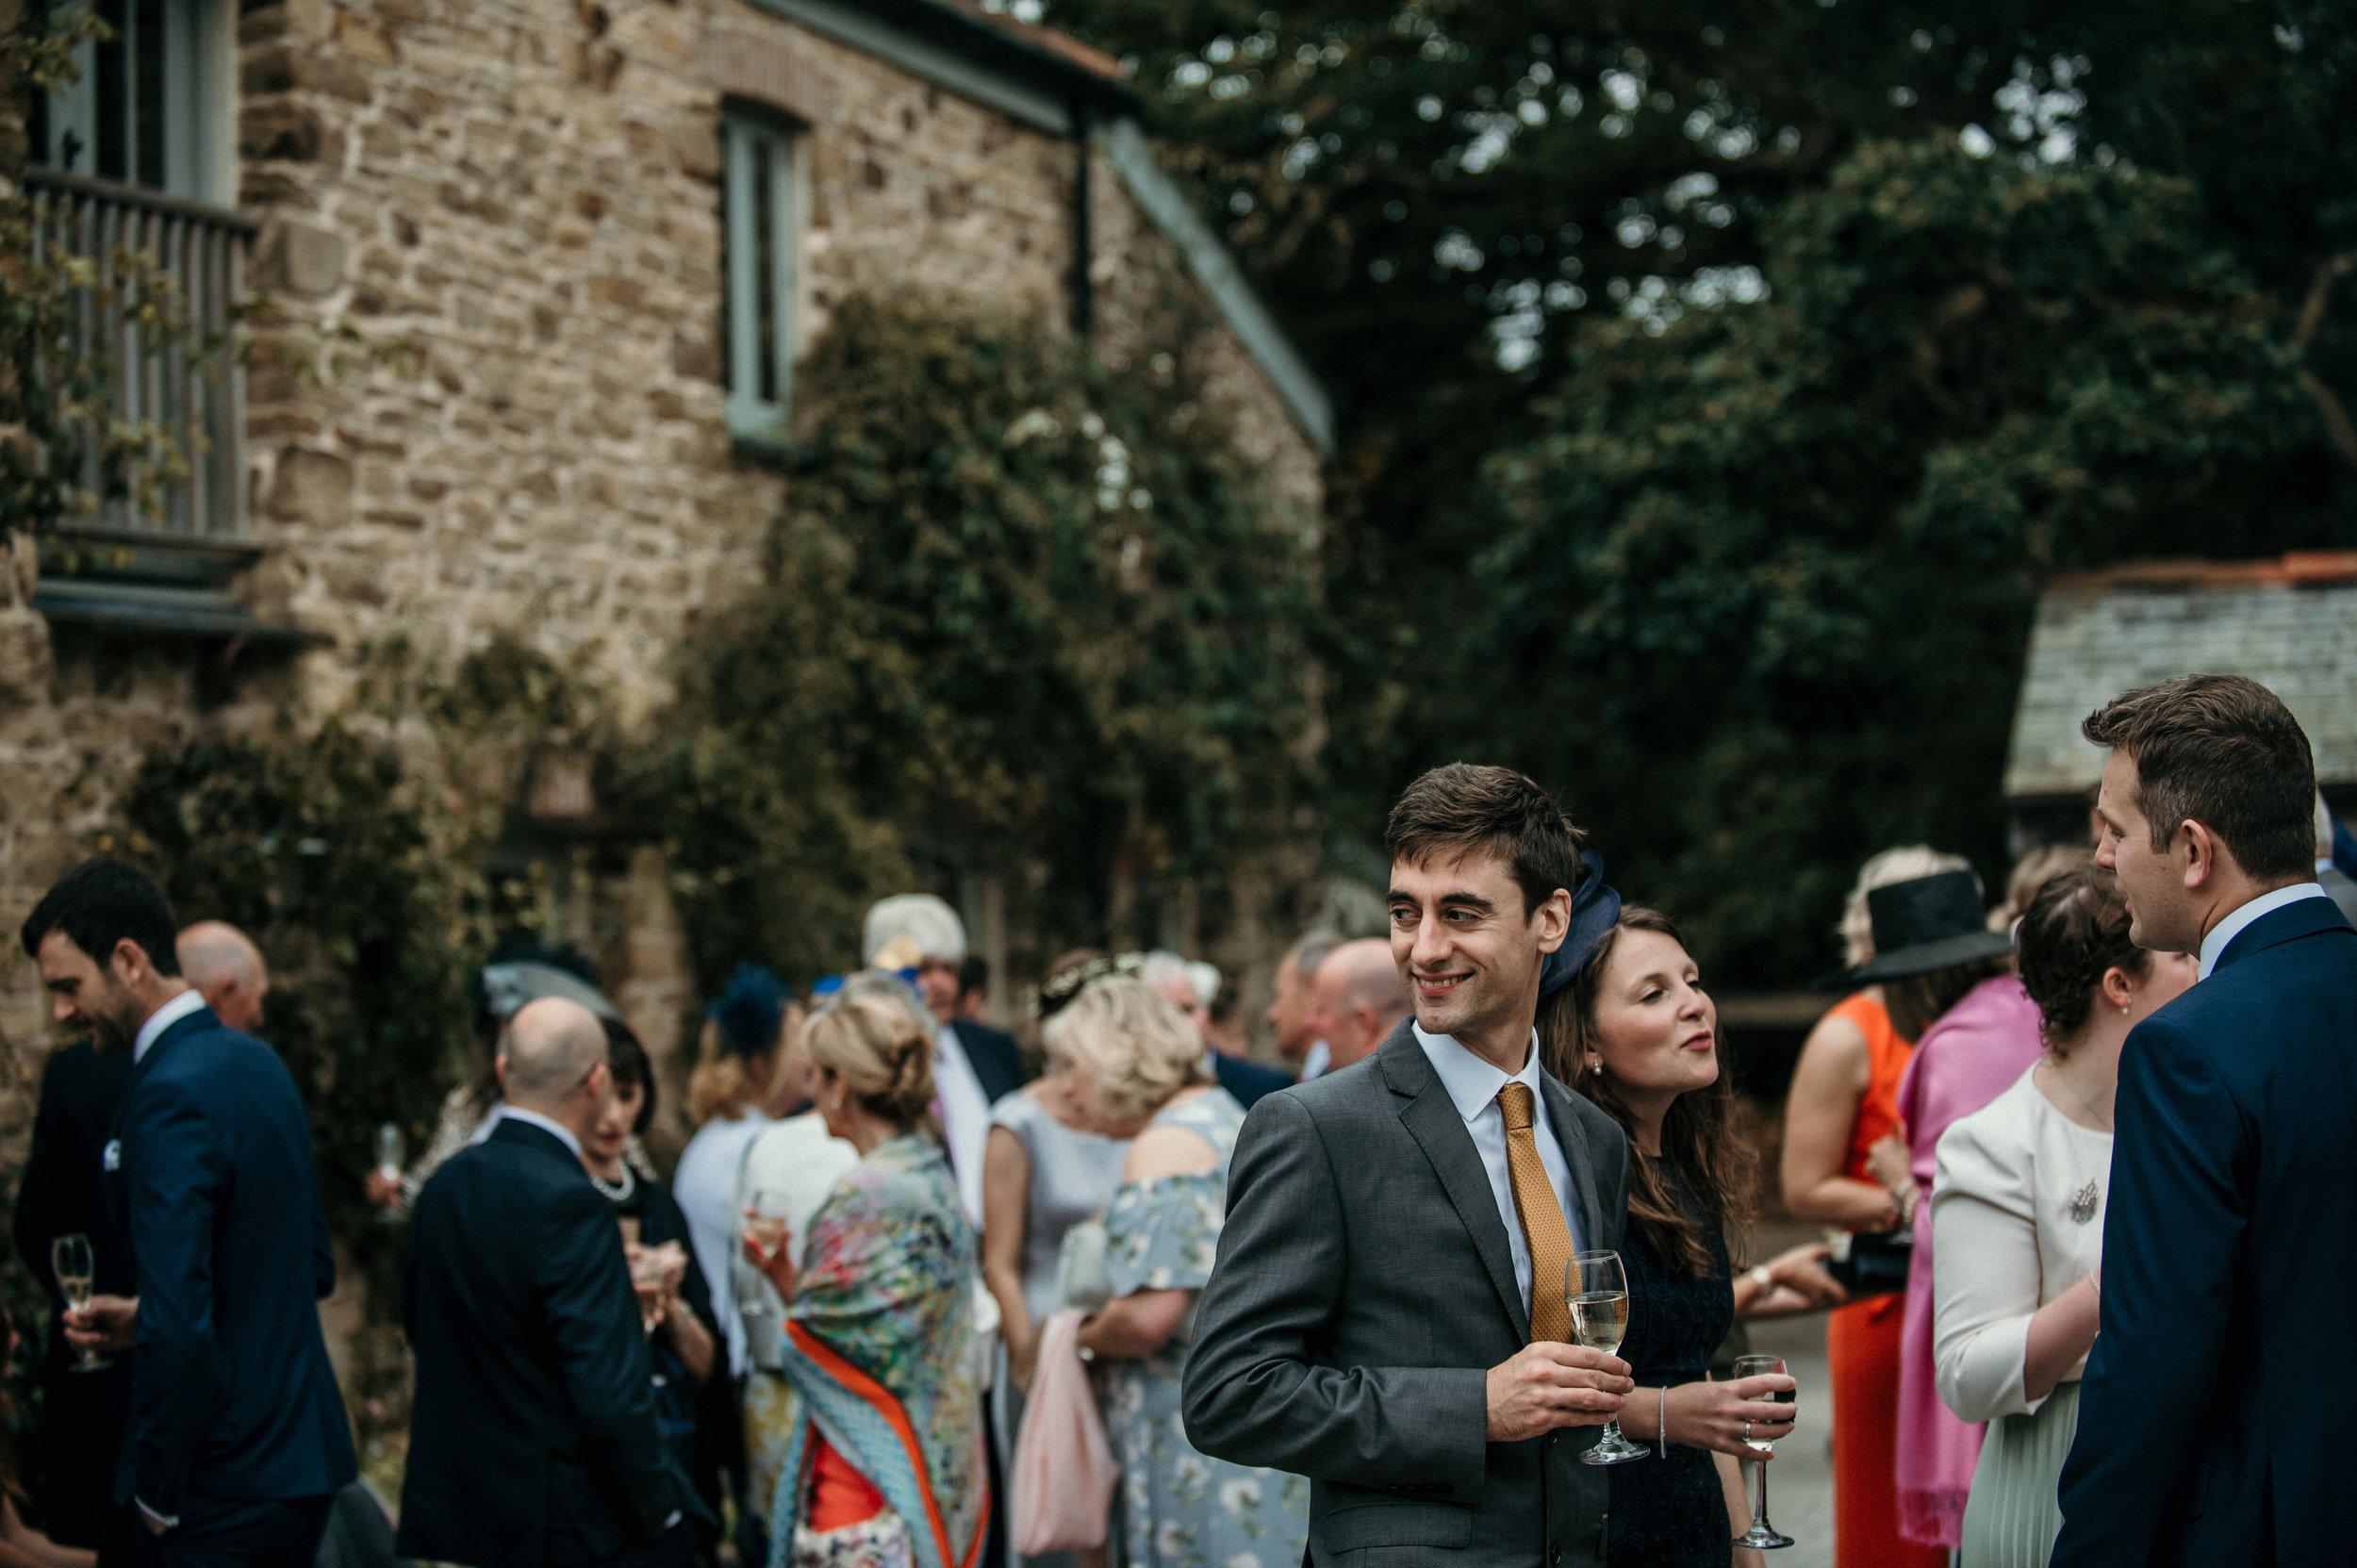 nancarrow-farm-wedding-photographer-cornwall-30.jpg